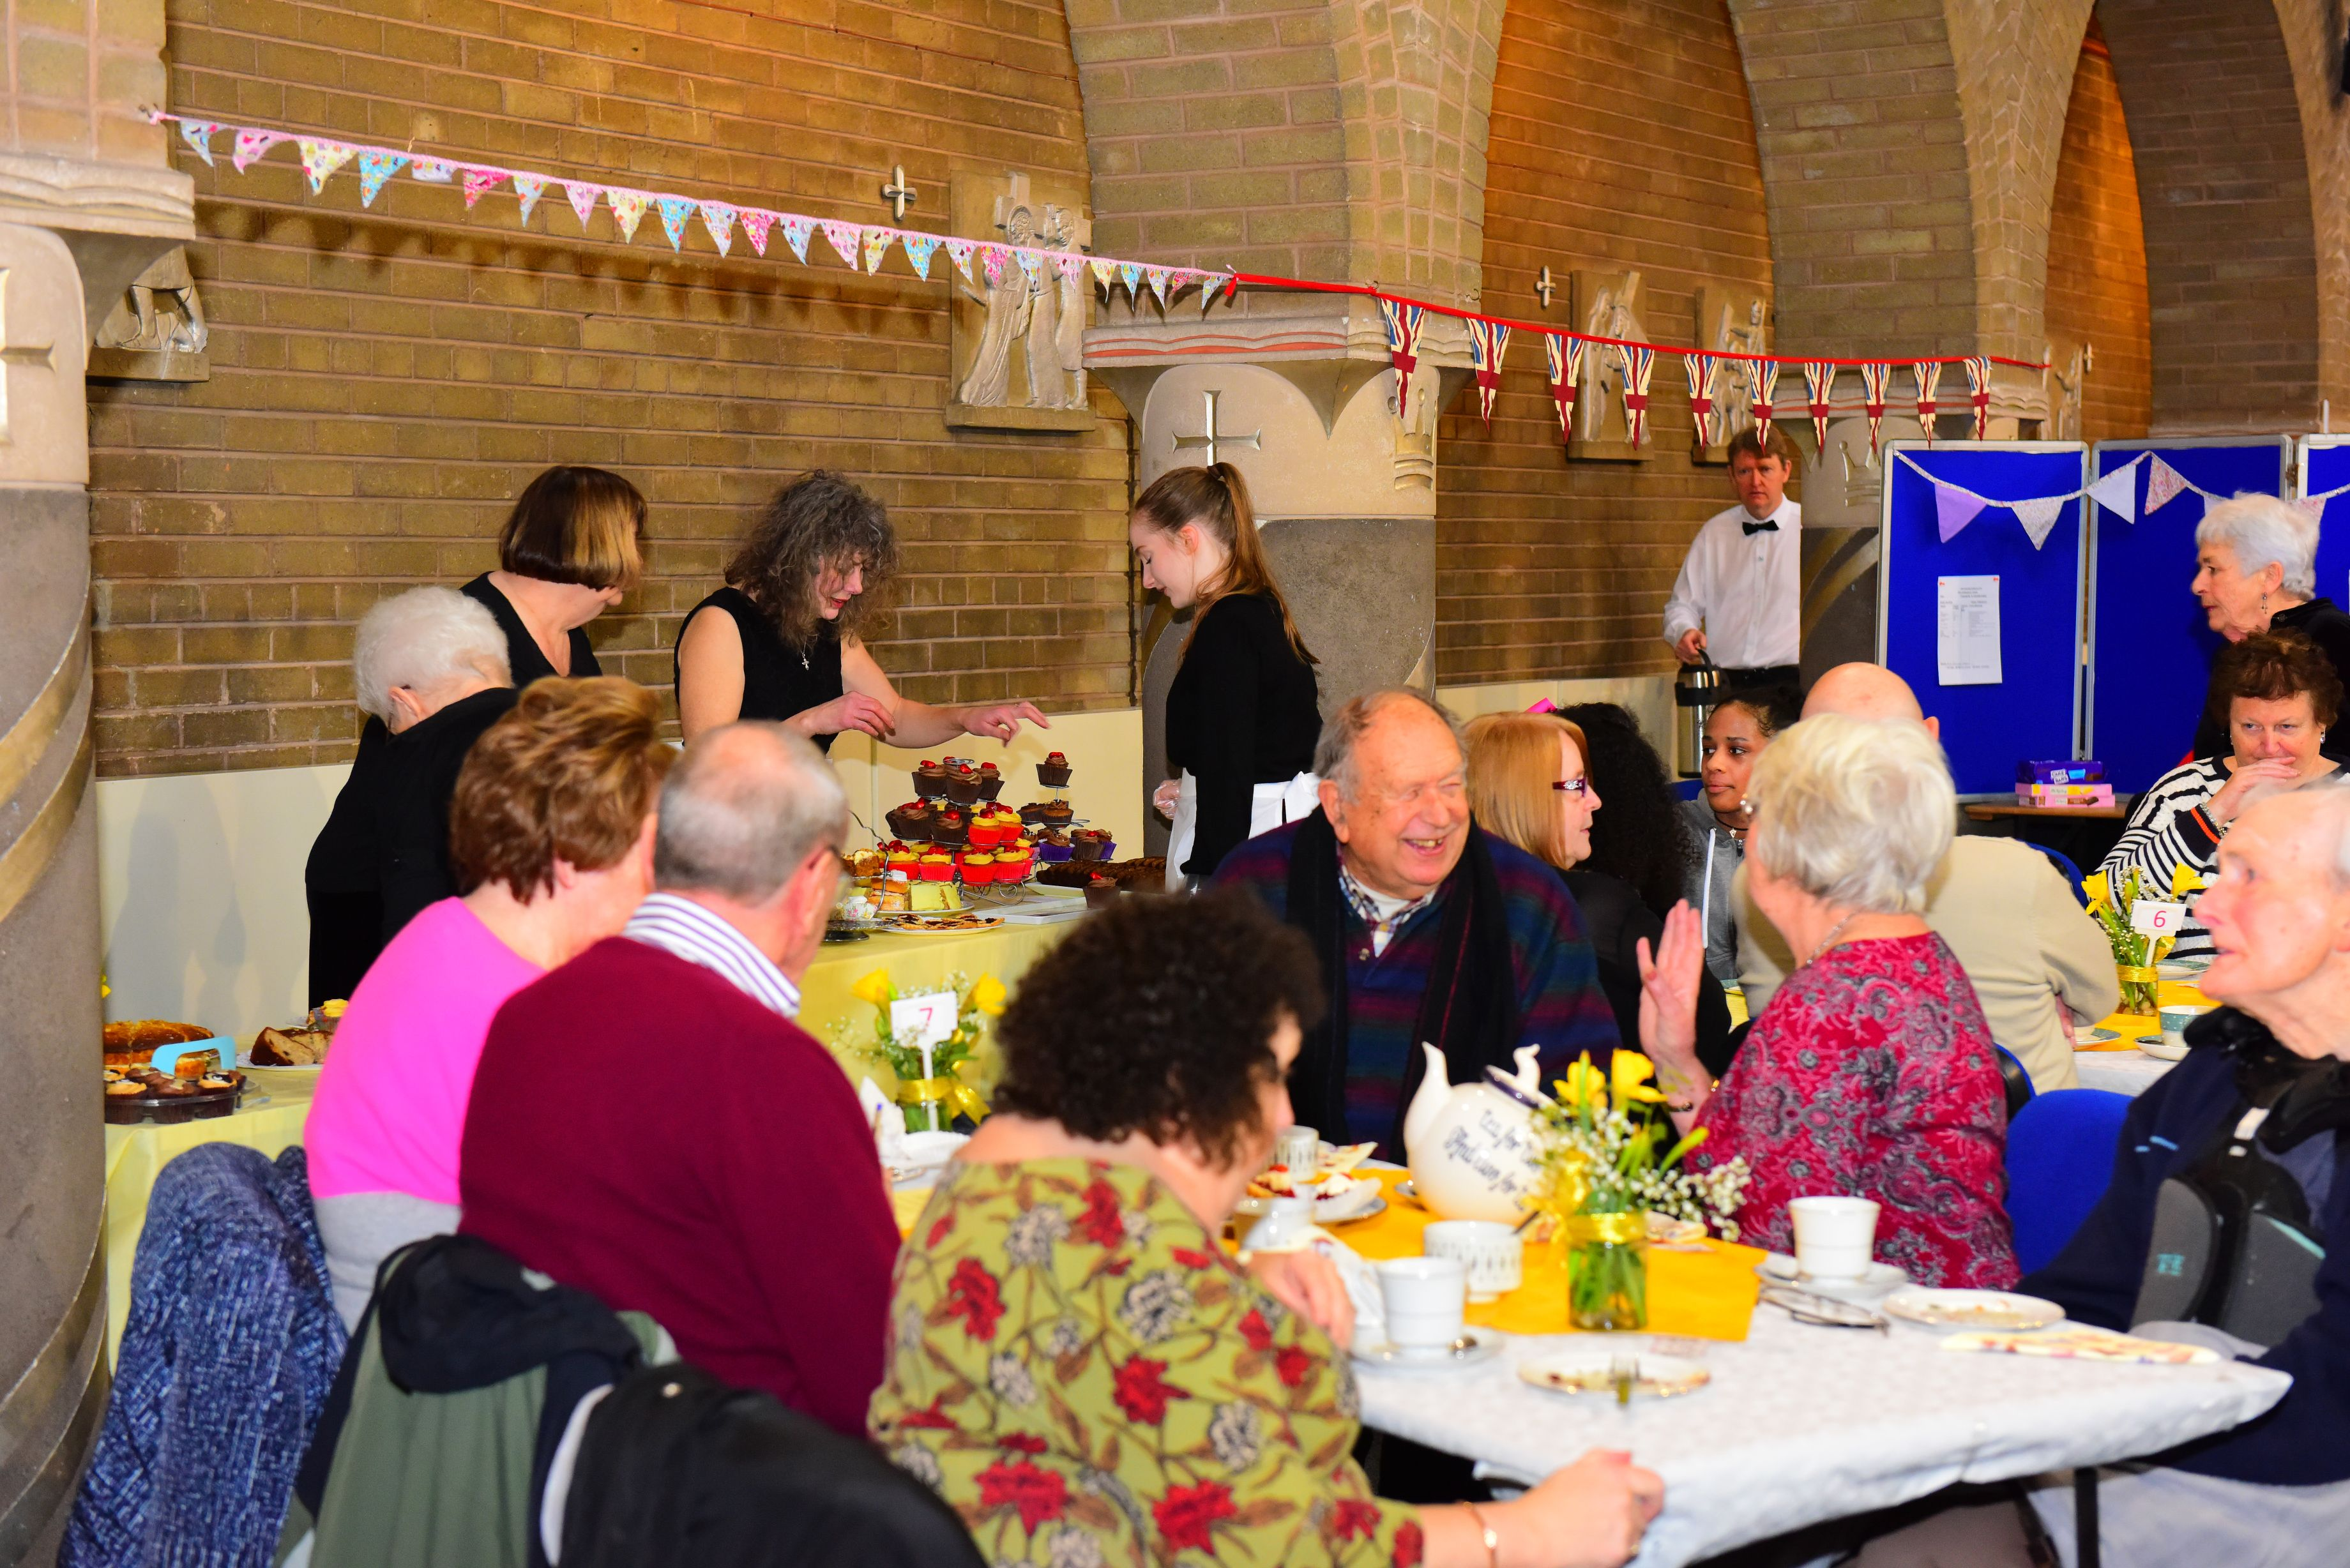 SVP tea party in full swing